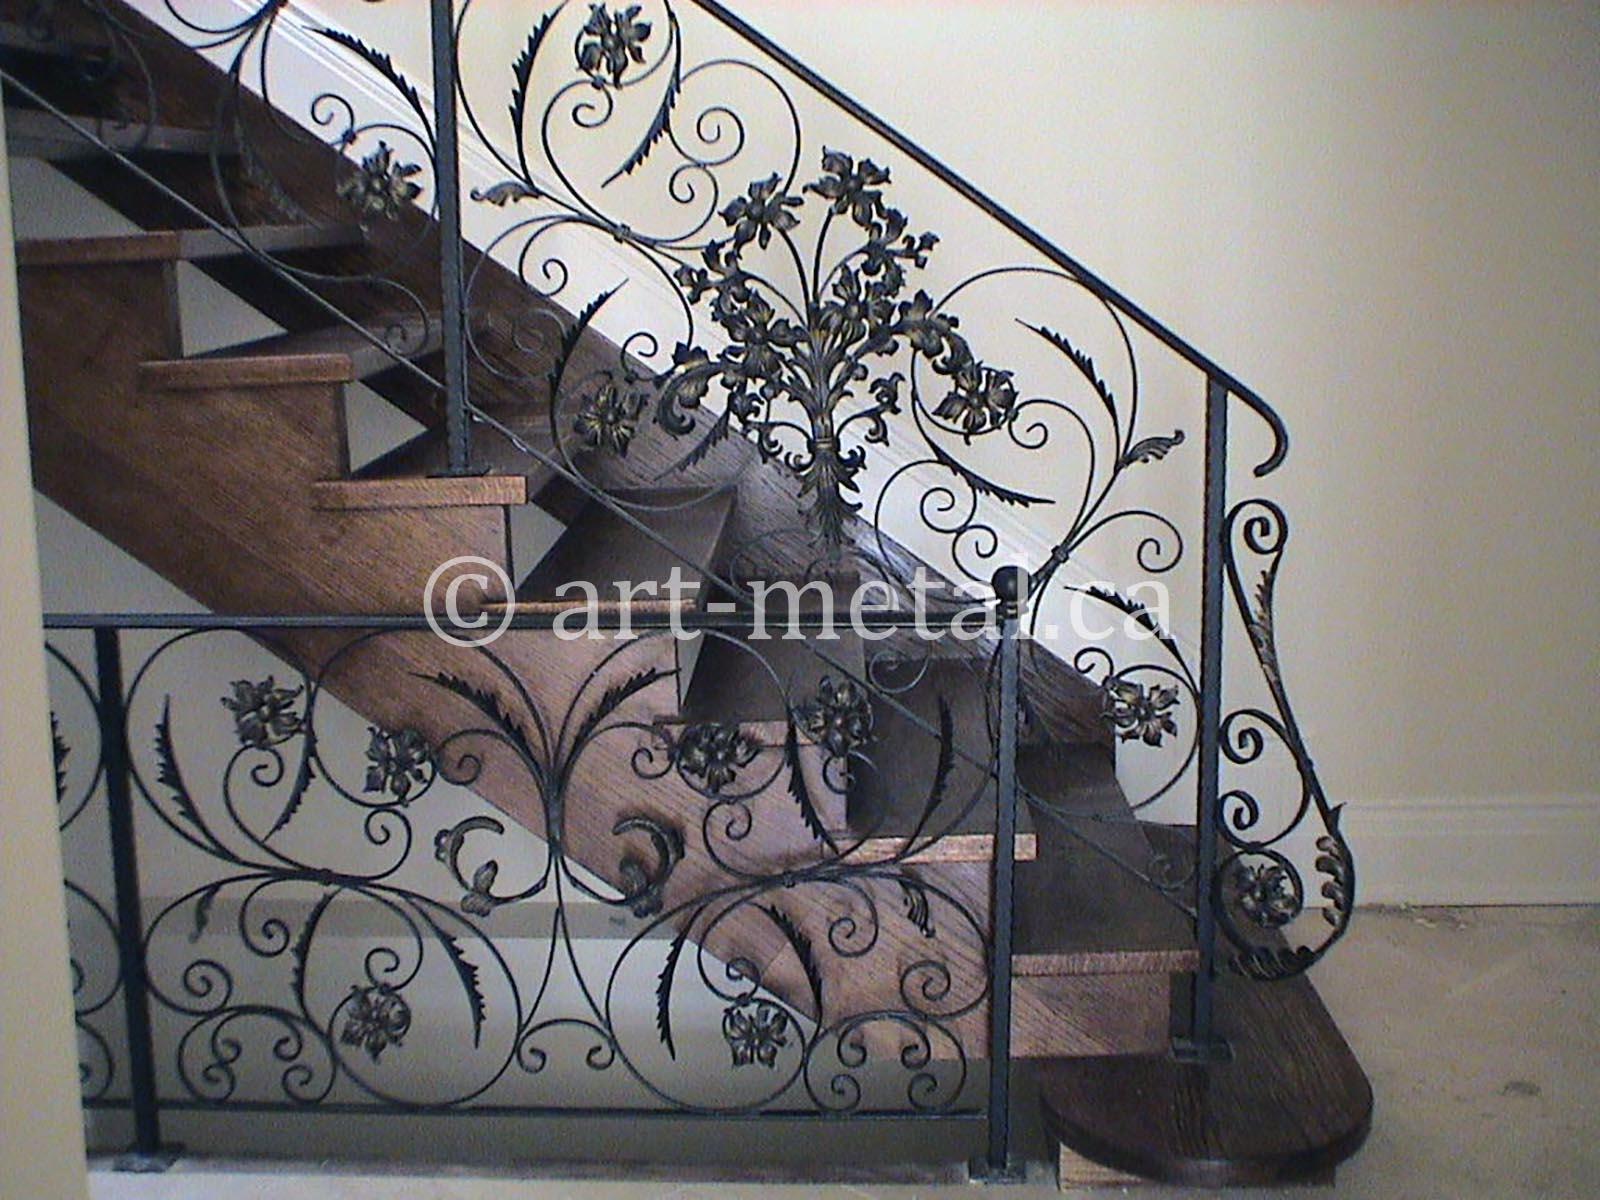 Get Original Wrought Iron Designs for Gates and Railings